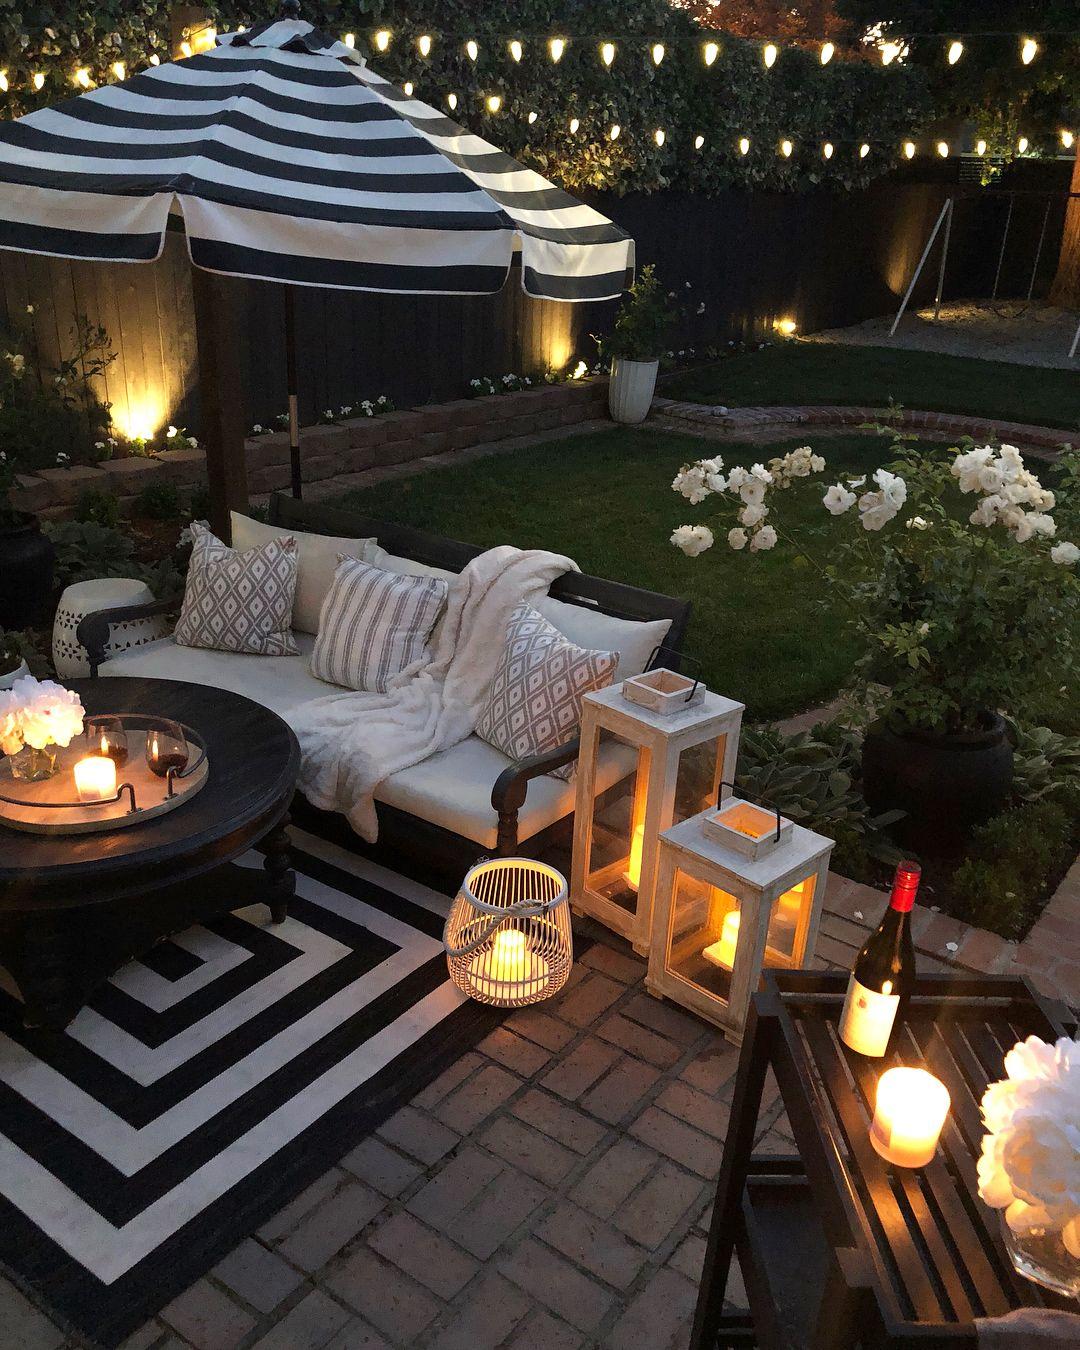 Marvelous backyard decor patio #outdoor #backyard #backyardlandscaping #backyardgarden #smallbackyard